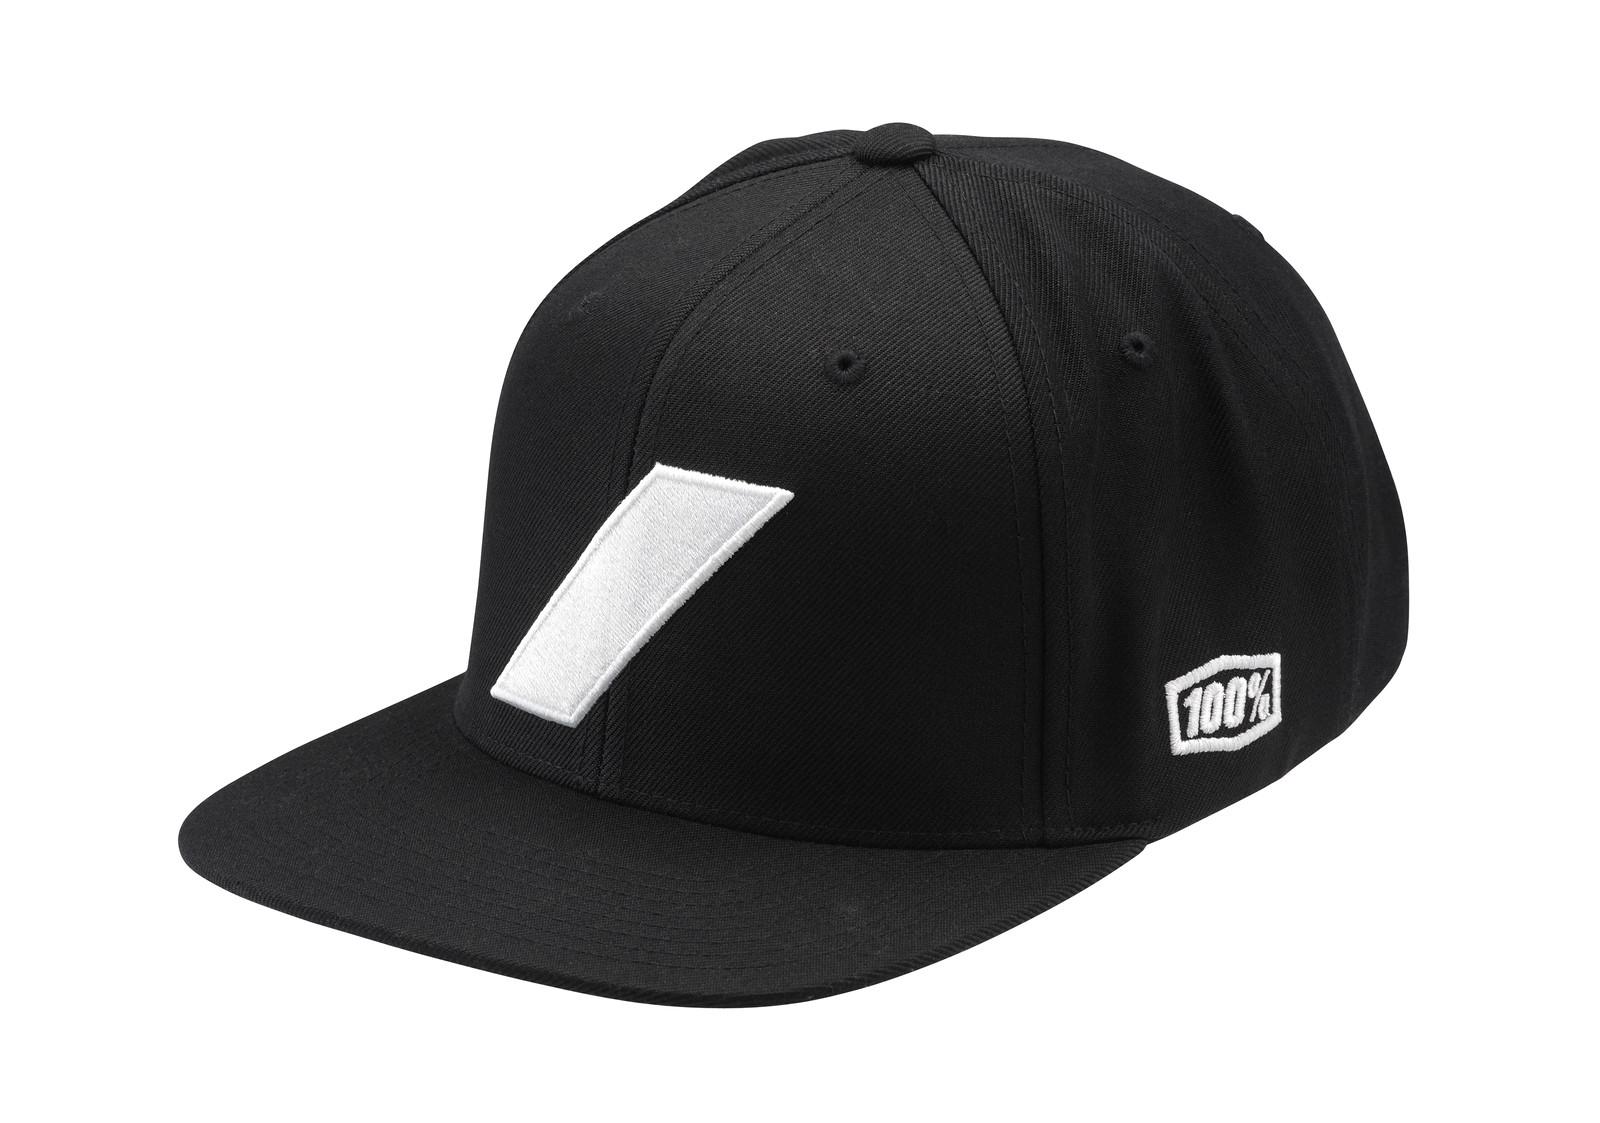 100% Slash Black Hat - 100percent - Motocross Pictures - Vital MX